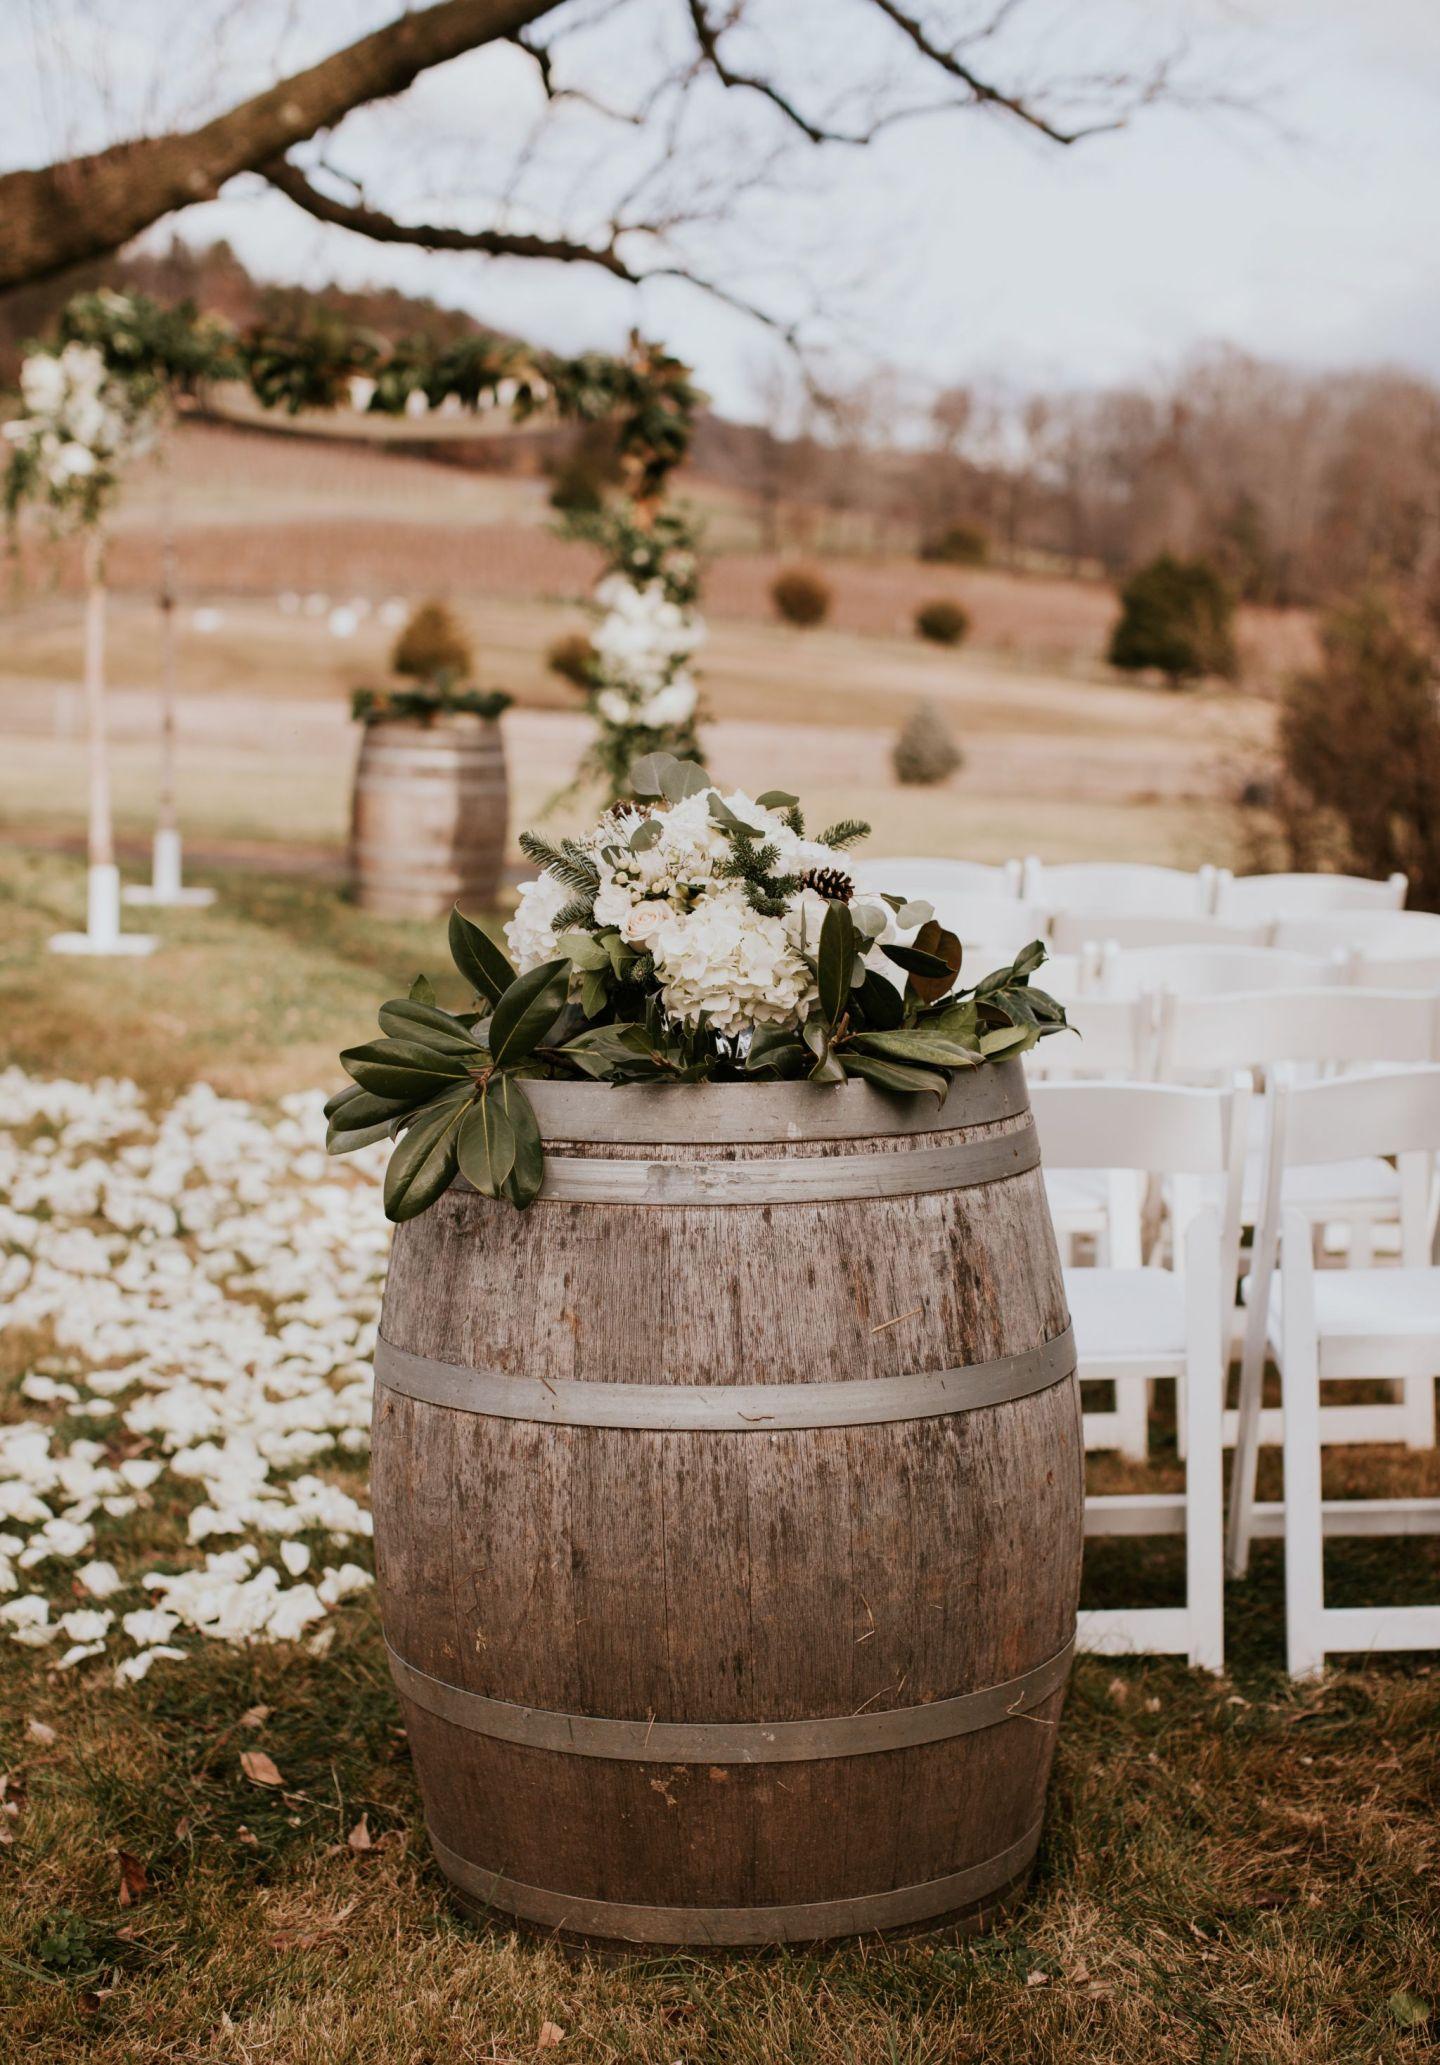 winter wedding flowers - winter chuppah - chuppah with magnolia - winery chuppah